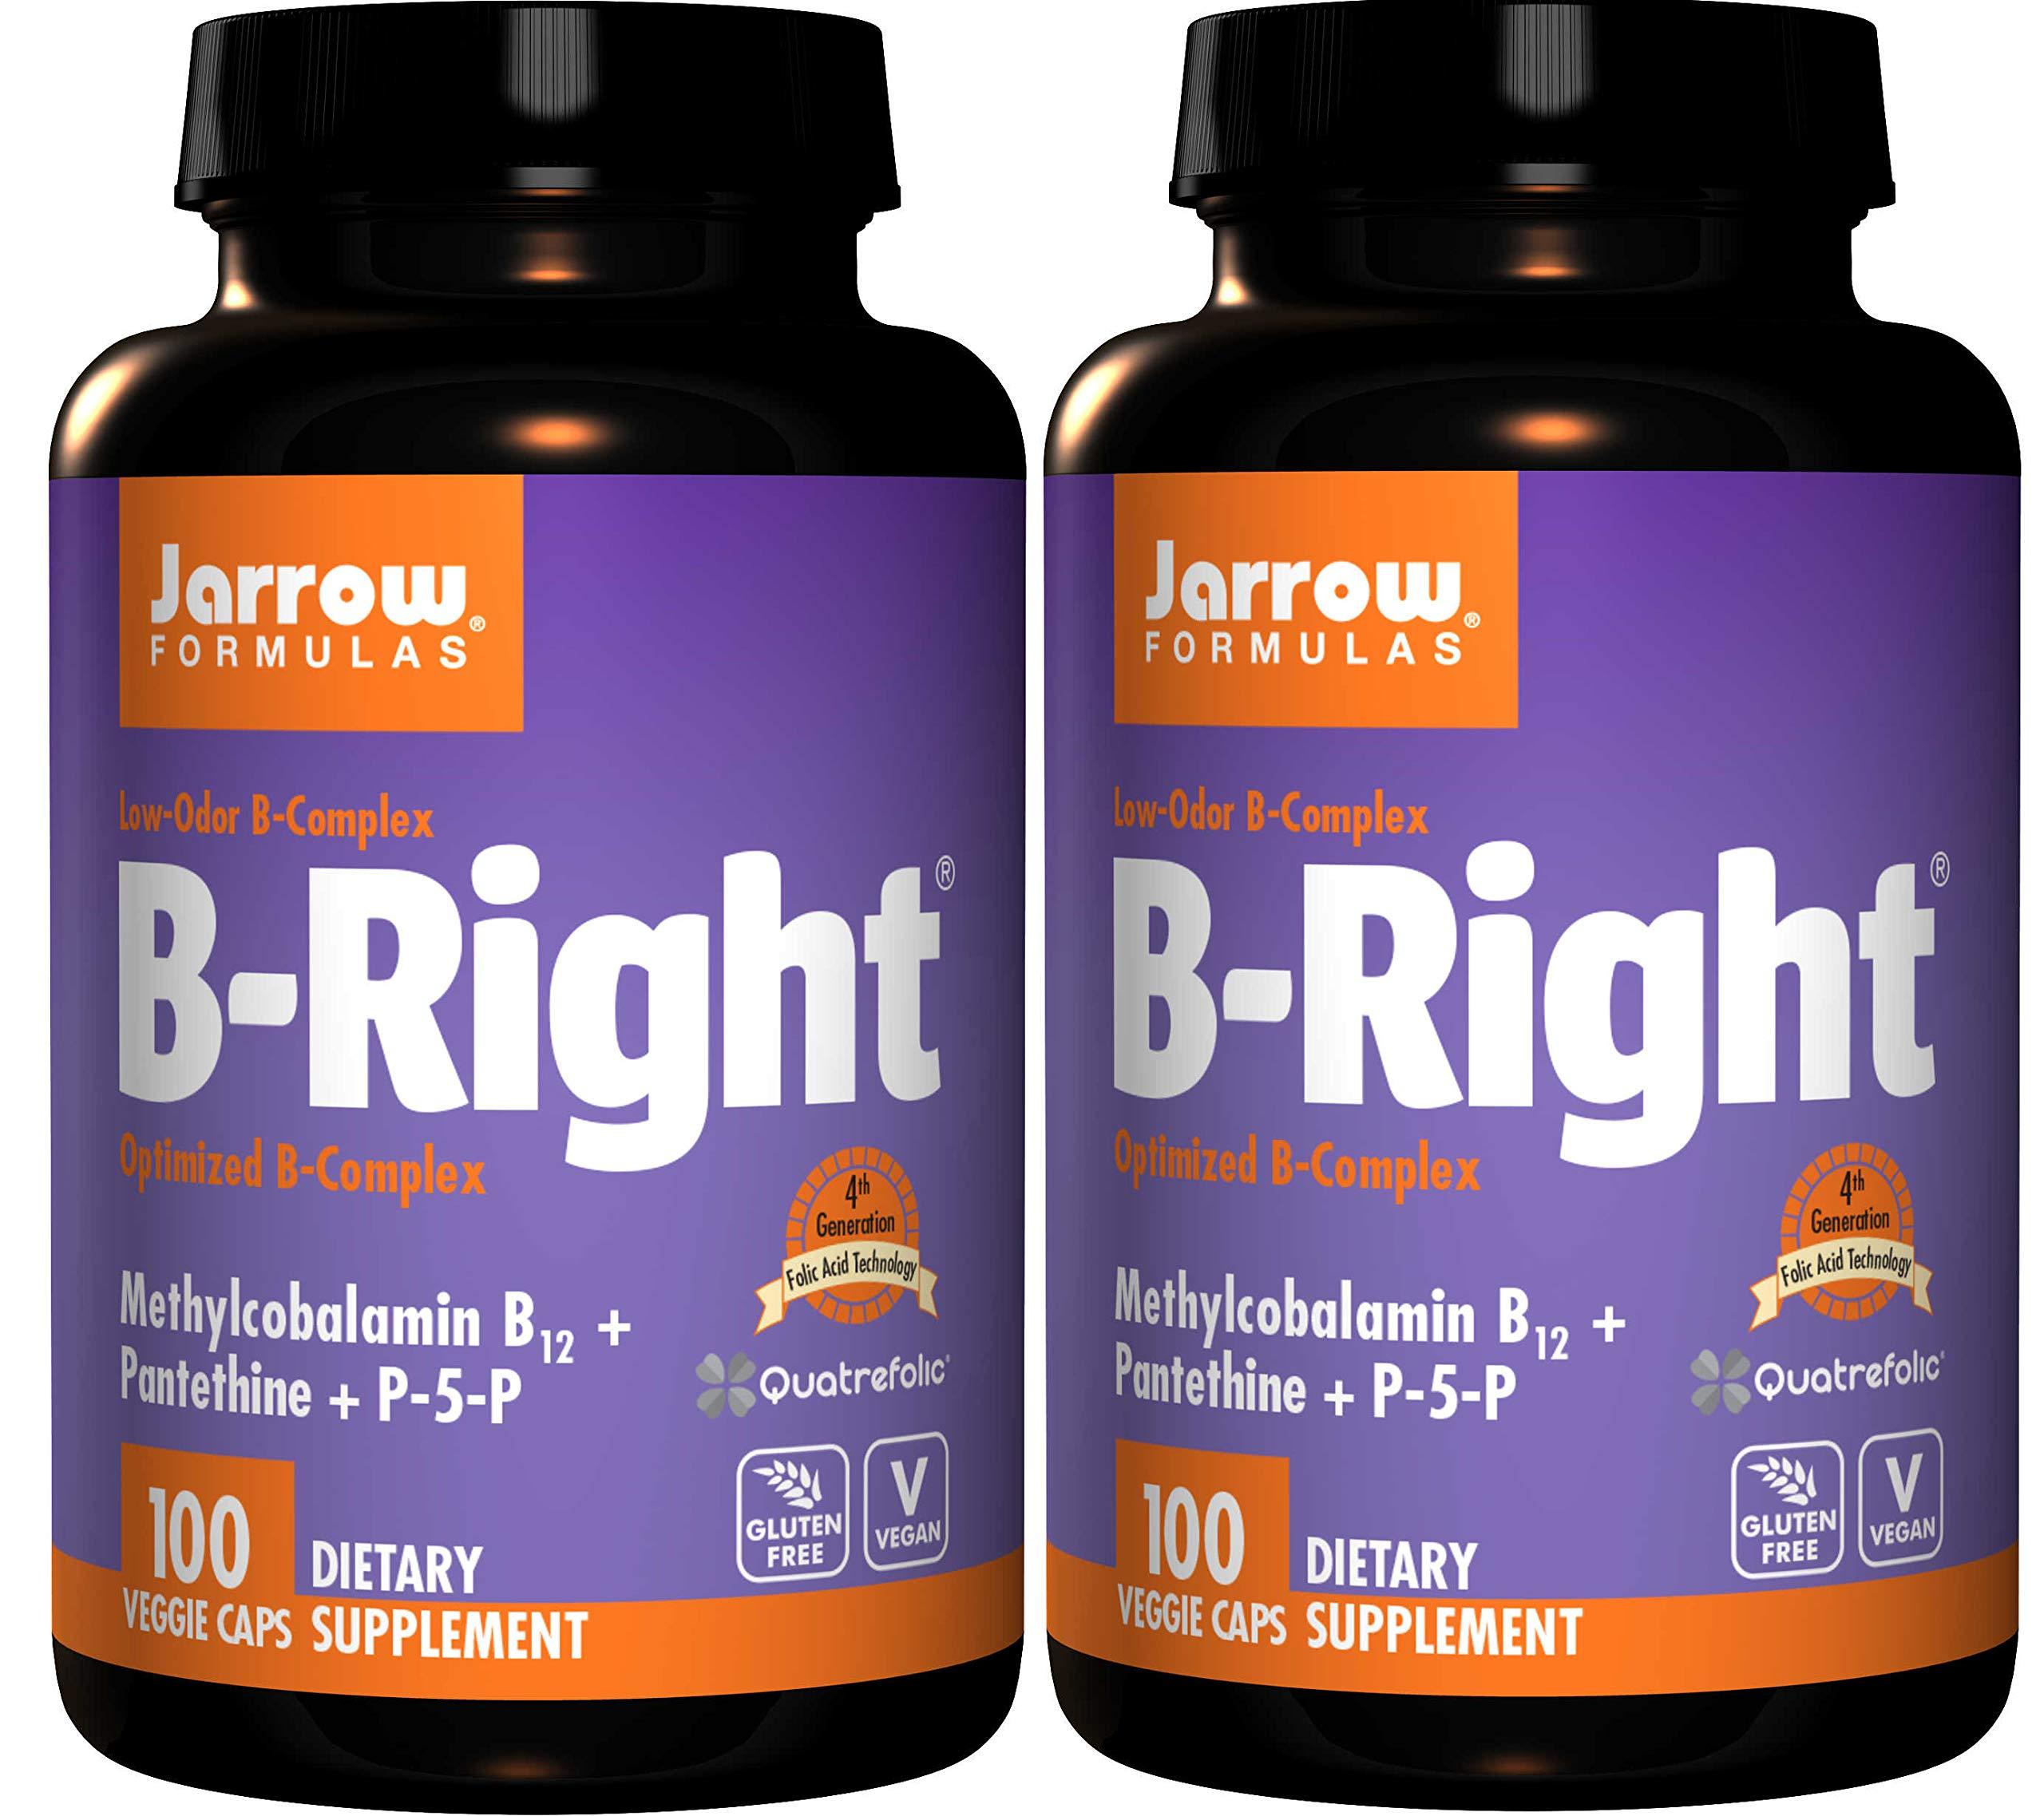 Jarrow Formulas B-Right Optimized B-Complex Methylcobalamin B12 + Pantethine + P-5-P Featuring 4th Generation Folic Acid Technology Vegan and Gluten Free (100 Veggie Caps) Pack of 2